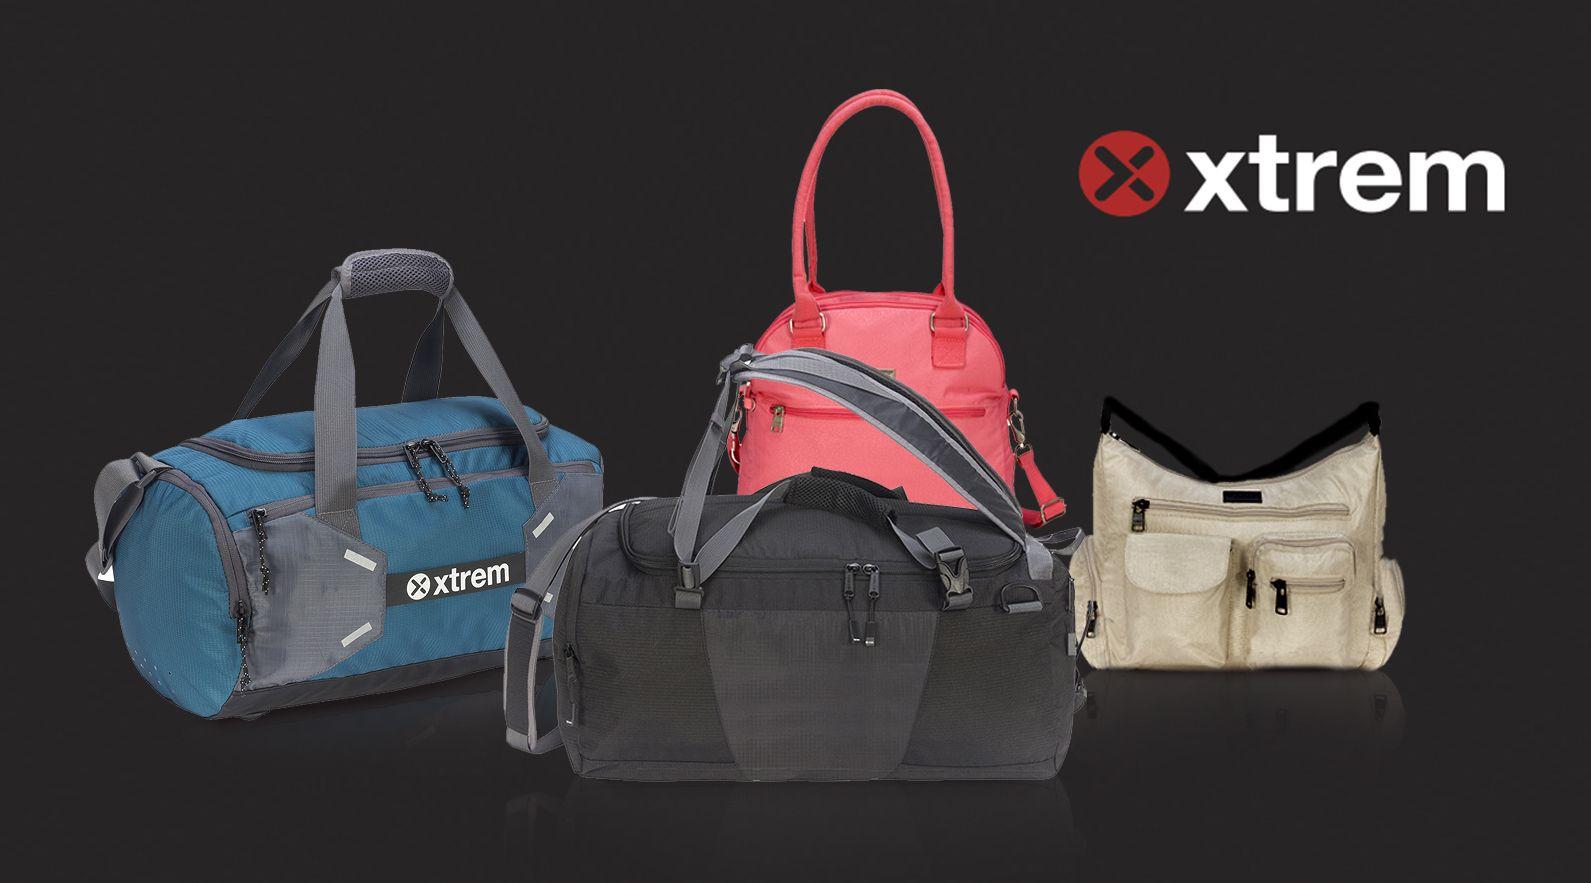 Xtrem Sport Bags la maleta ideal para hacer ejercicio